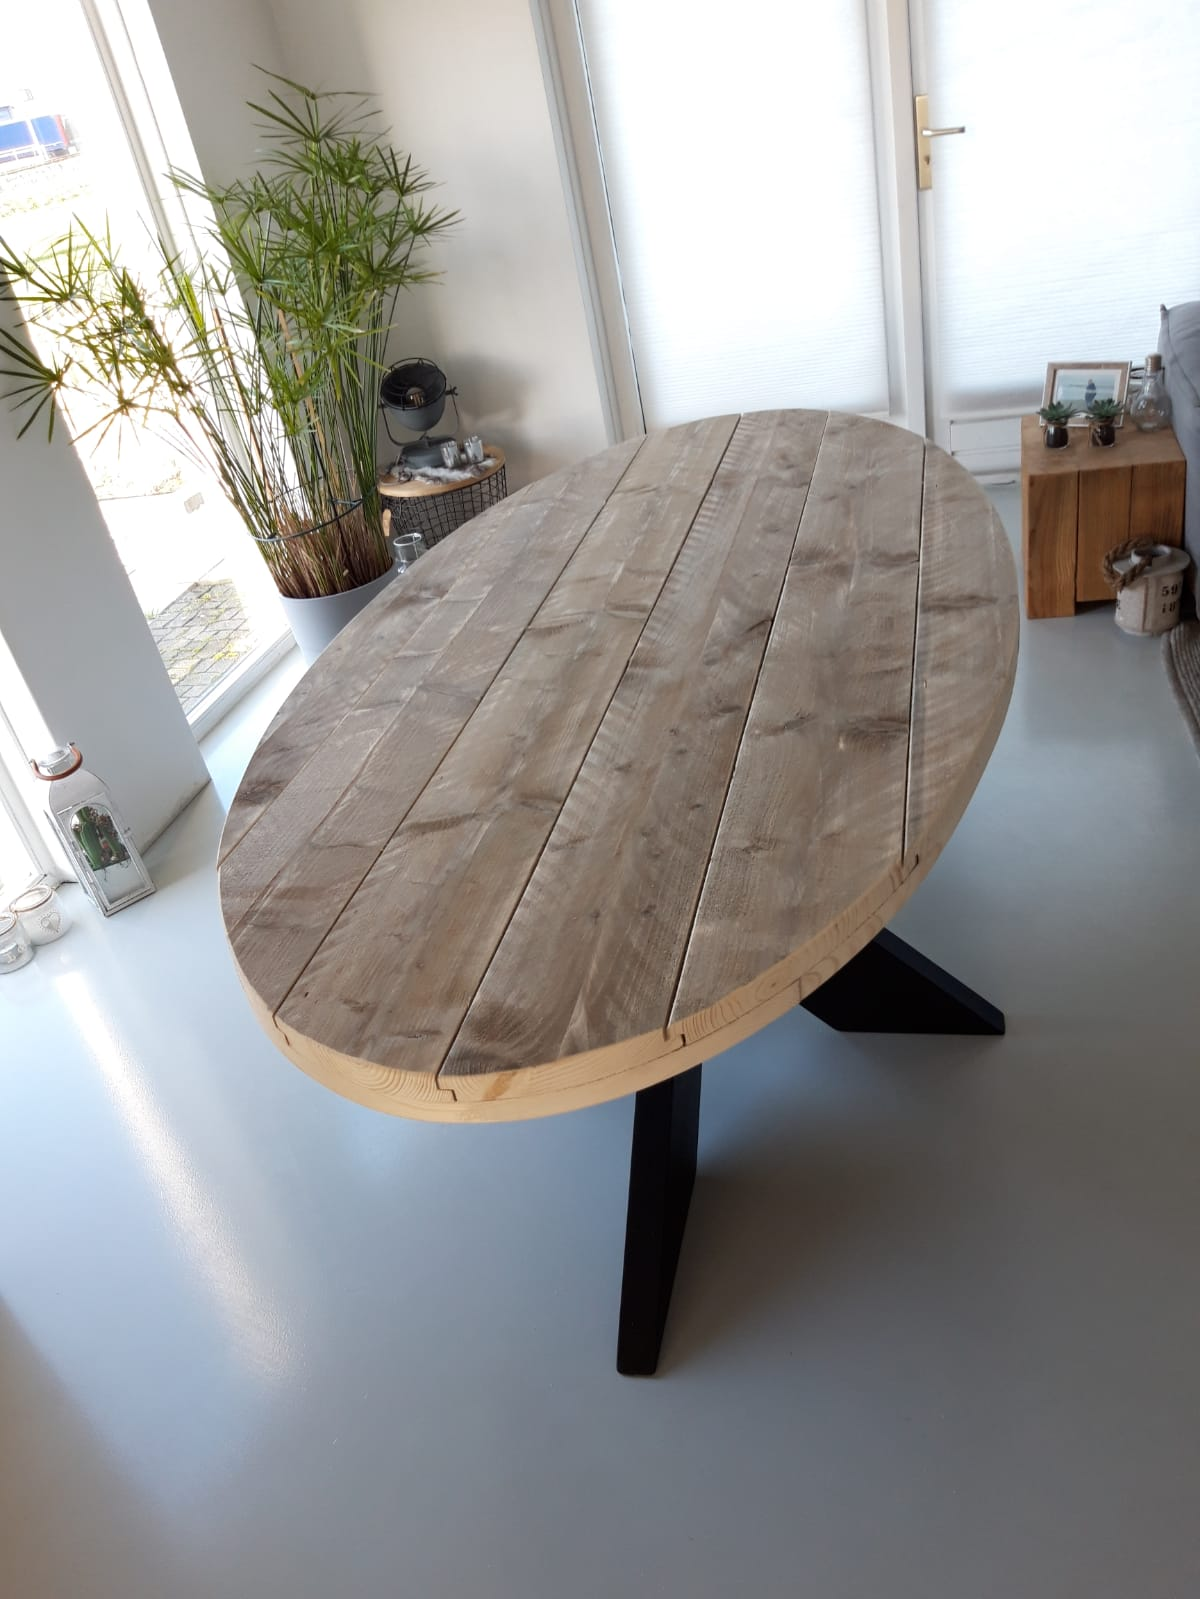 ovale-tafel-steigerhout-met-zwarte-kruispoot-mat-2-190x100